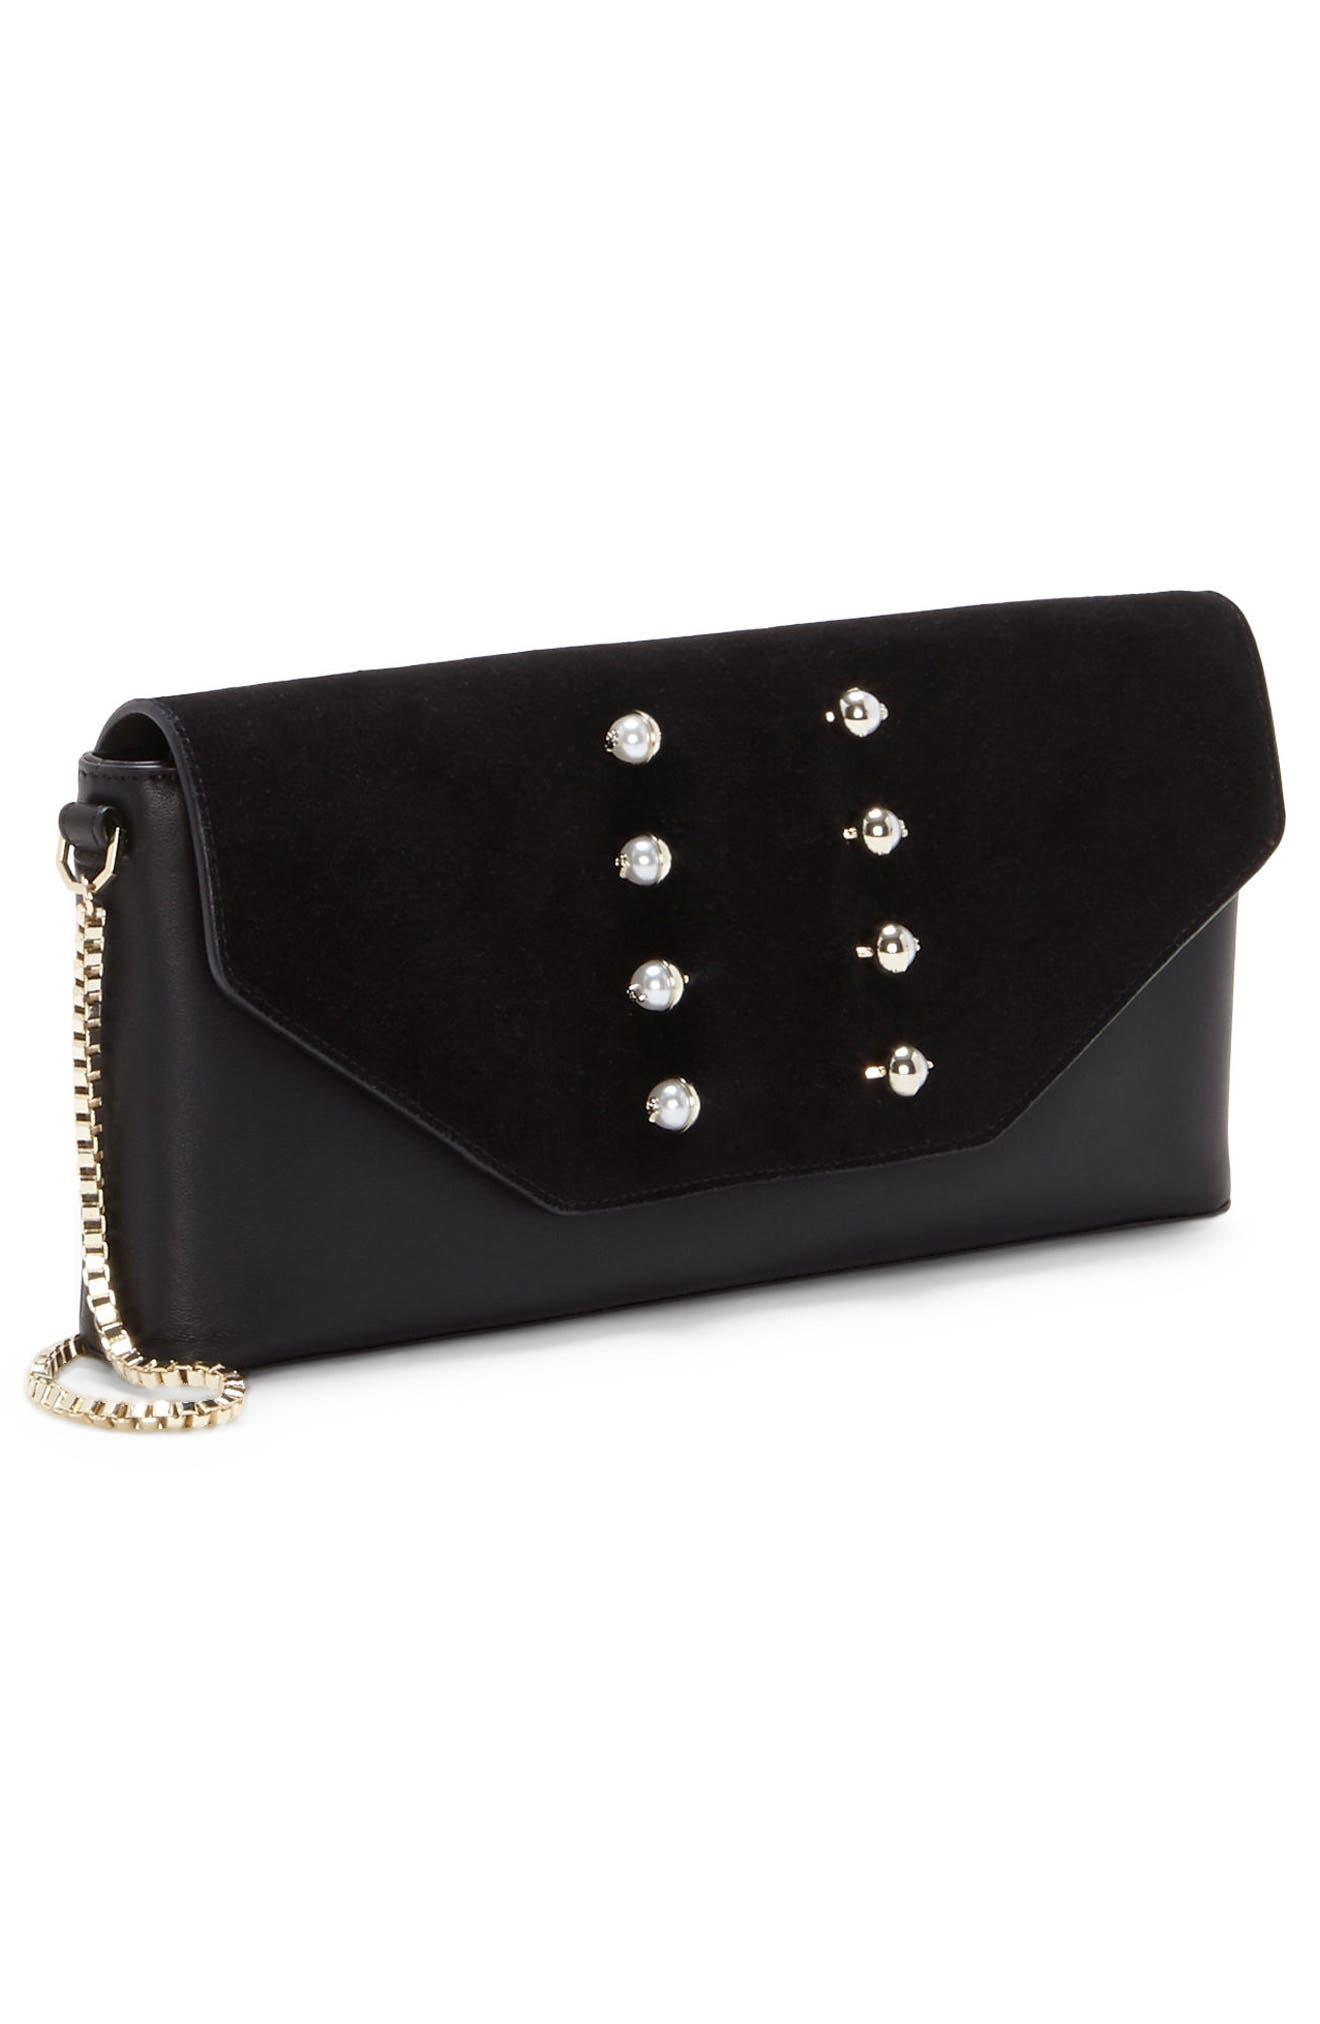 Gya Imitation Pearl Embellished Suede & Leather Clutch,                             Alternate thumbnail 4, color,                             Black